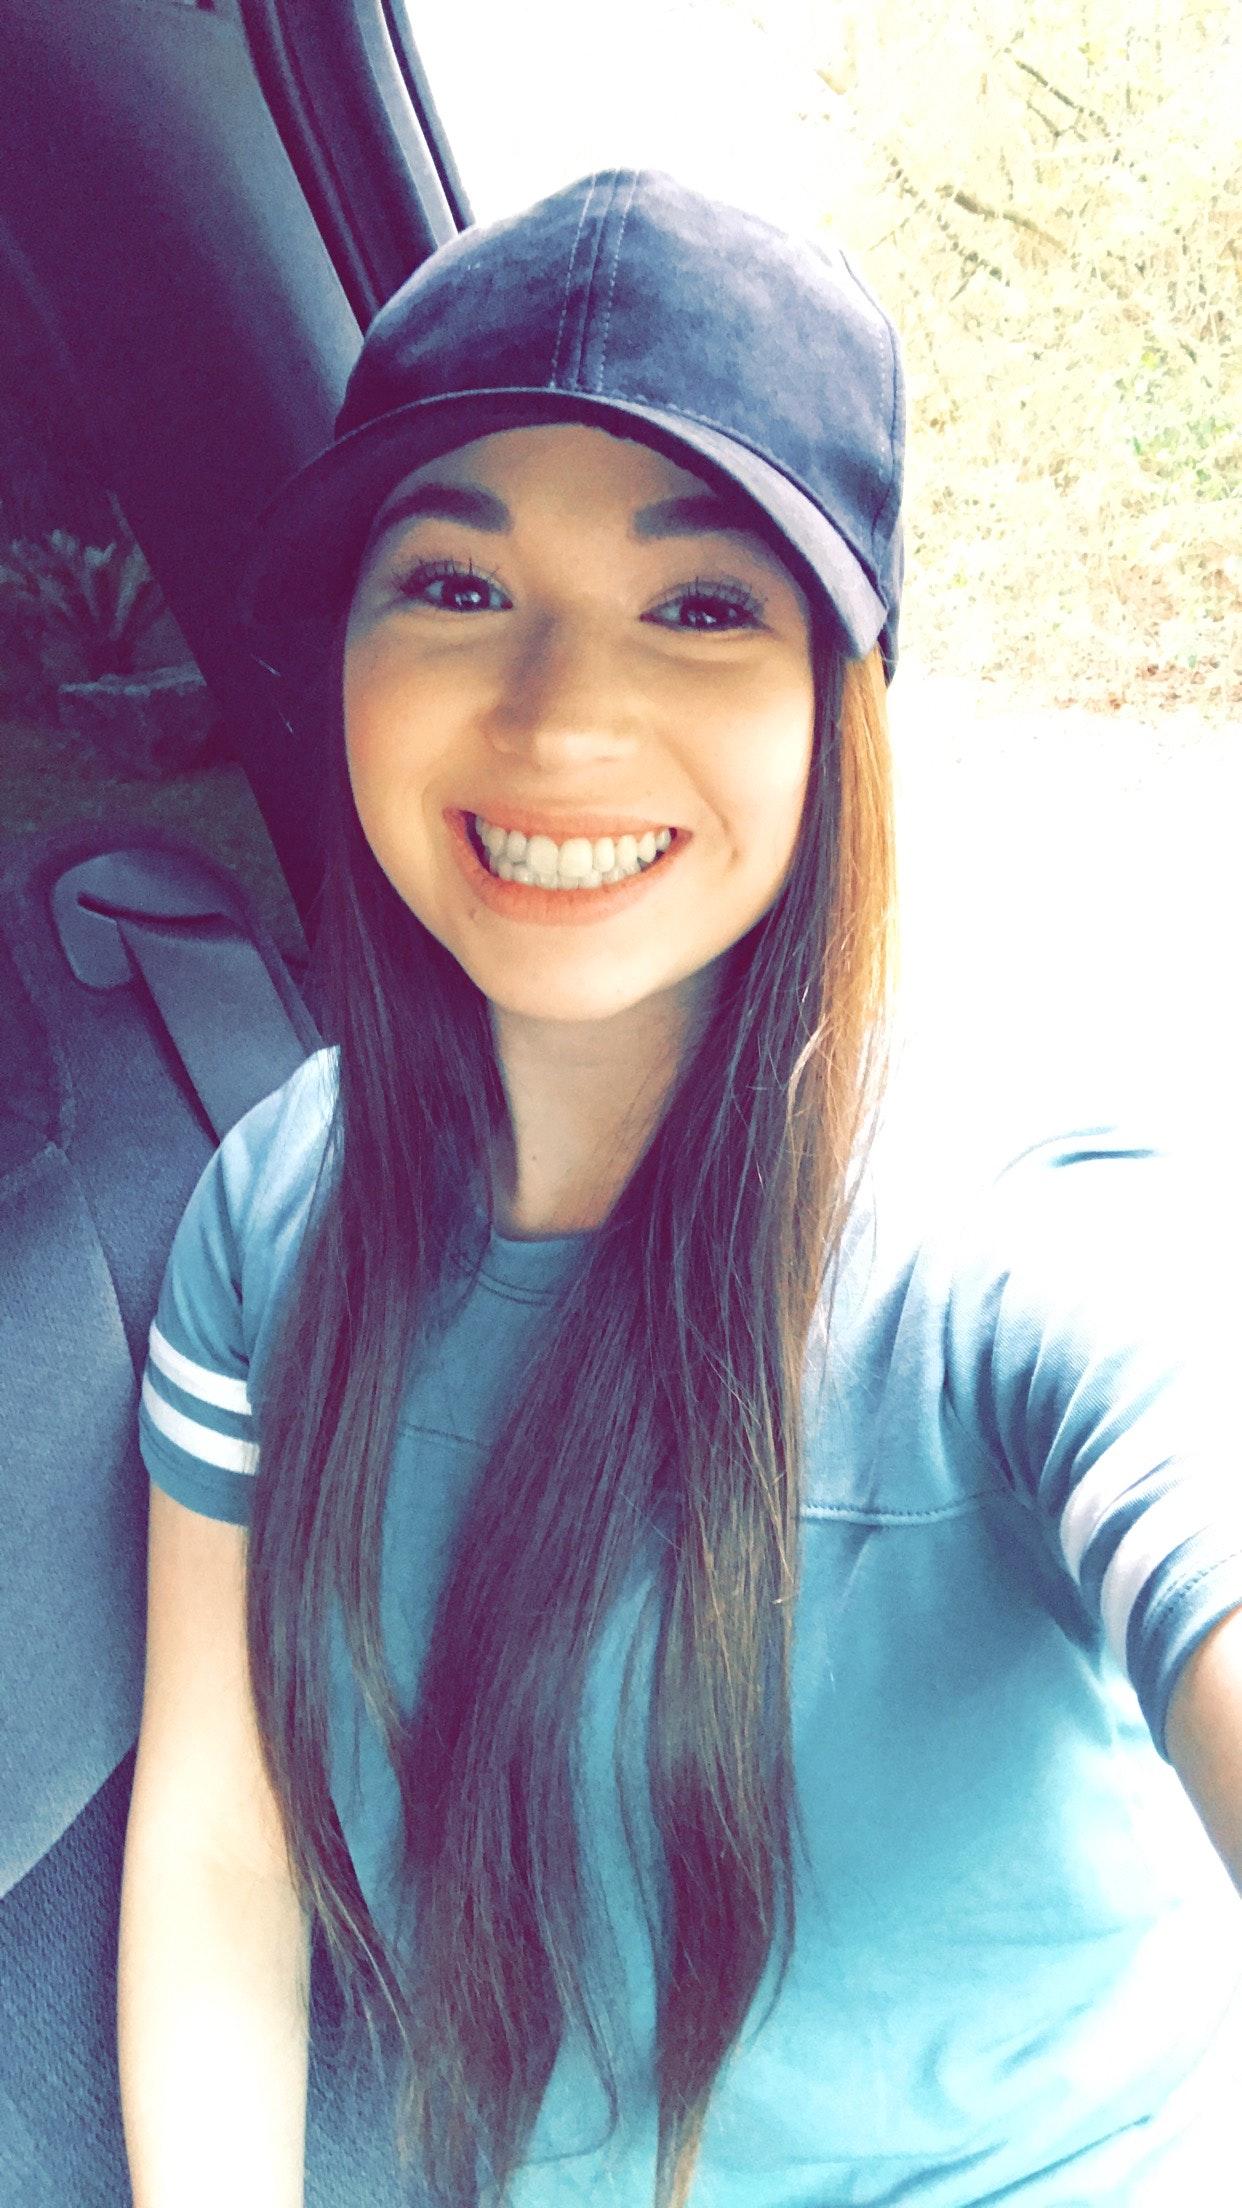 Free stock photo of Ball cap, selfie, smile